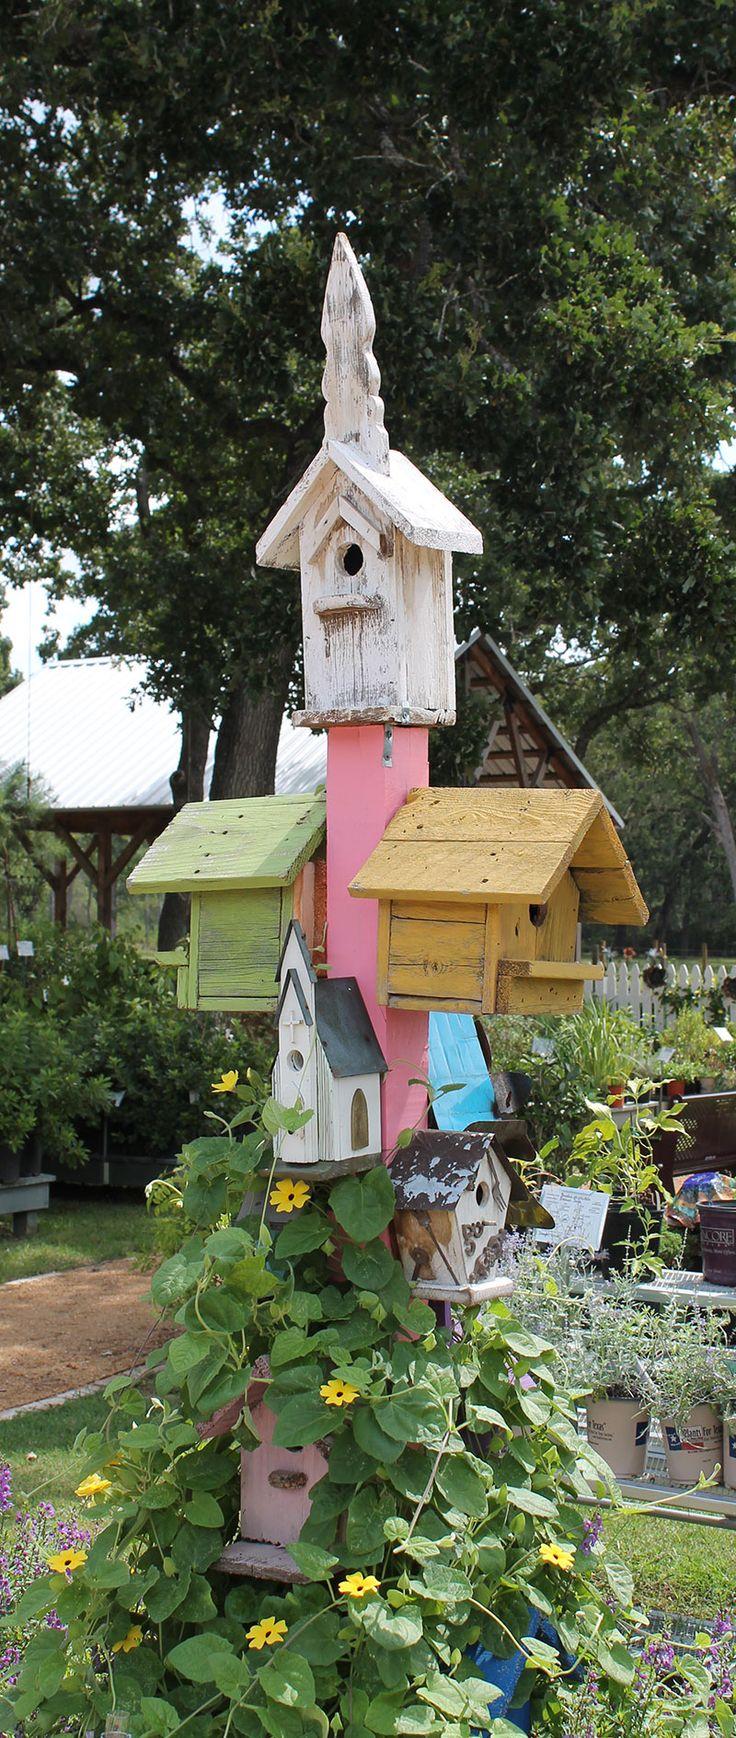 Birdhouse constructed of wood bird house design free standing bird - Wacky Creative Garden Art Blending Junk And Vintage Items Into Tasteful Garden Decor